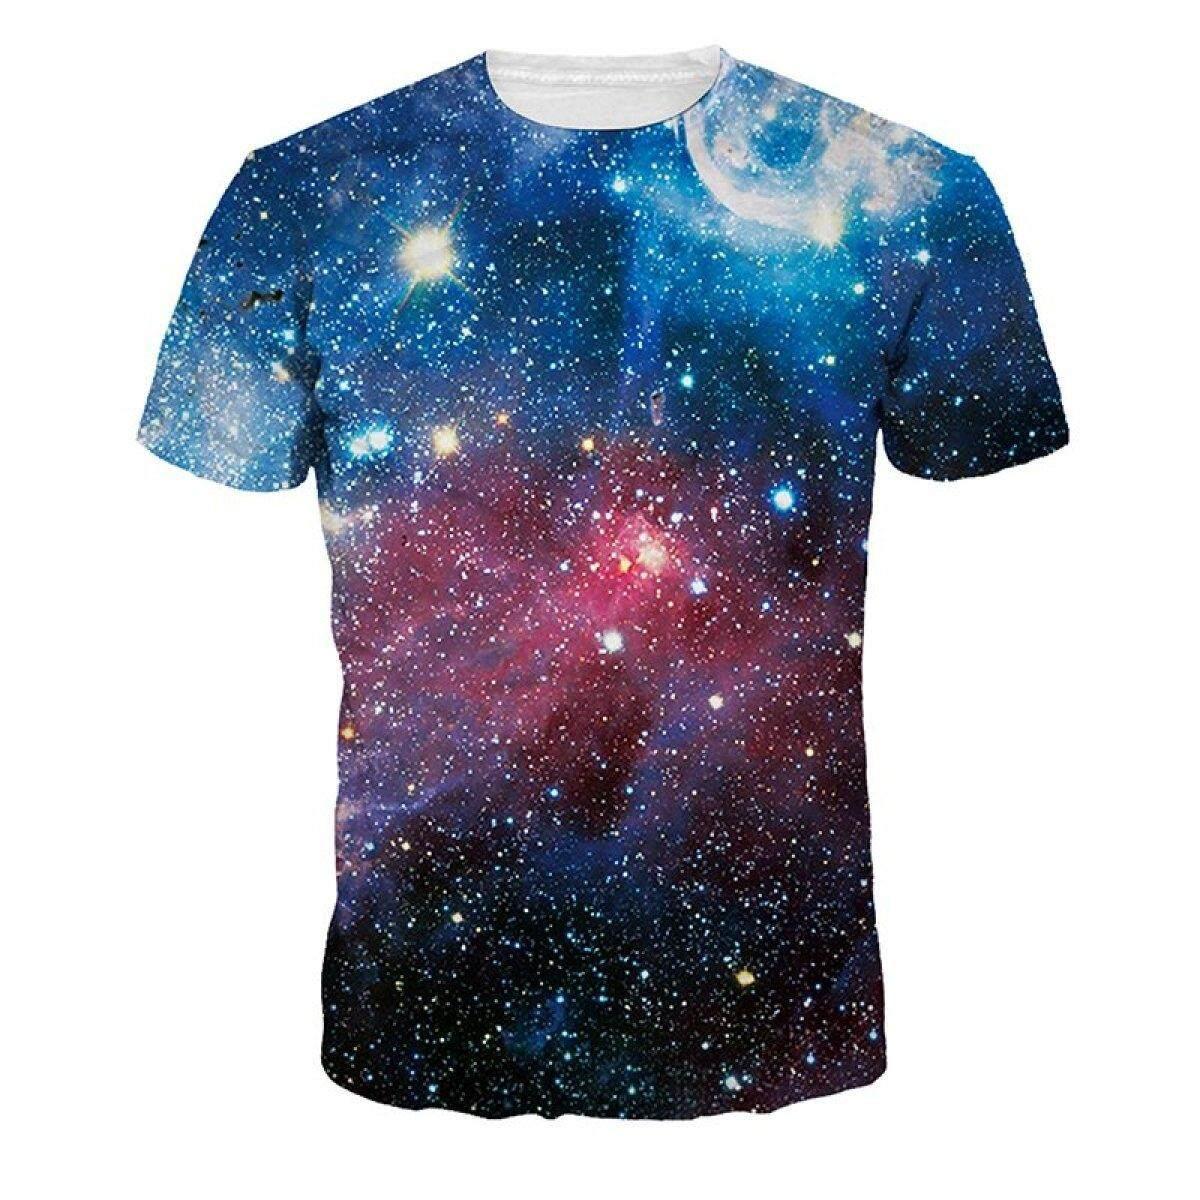 Jiayiqi Sparkly Galaxy Universe T-shirts Pretty 3D Digital Printed Tops